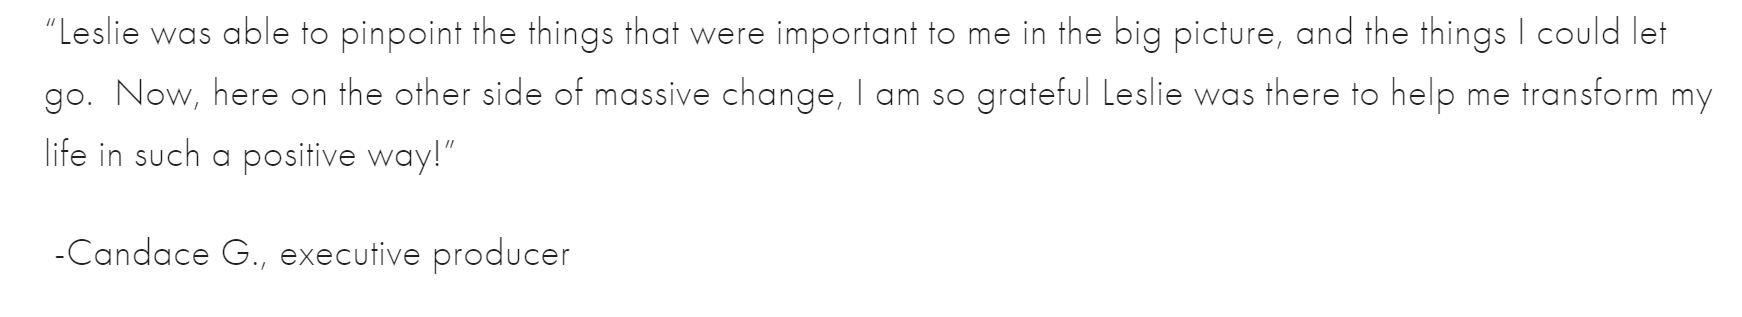 Candace Divorce Coach self improvement change.JPG